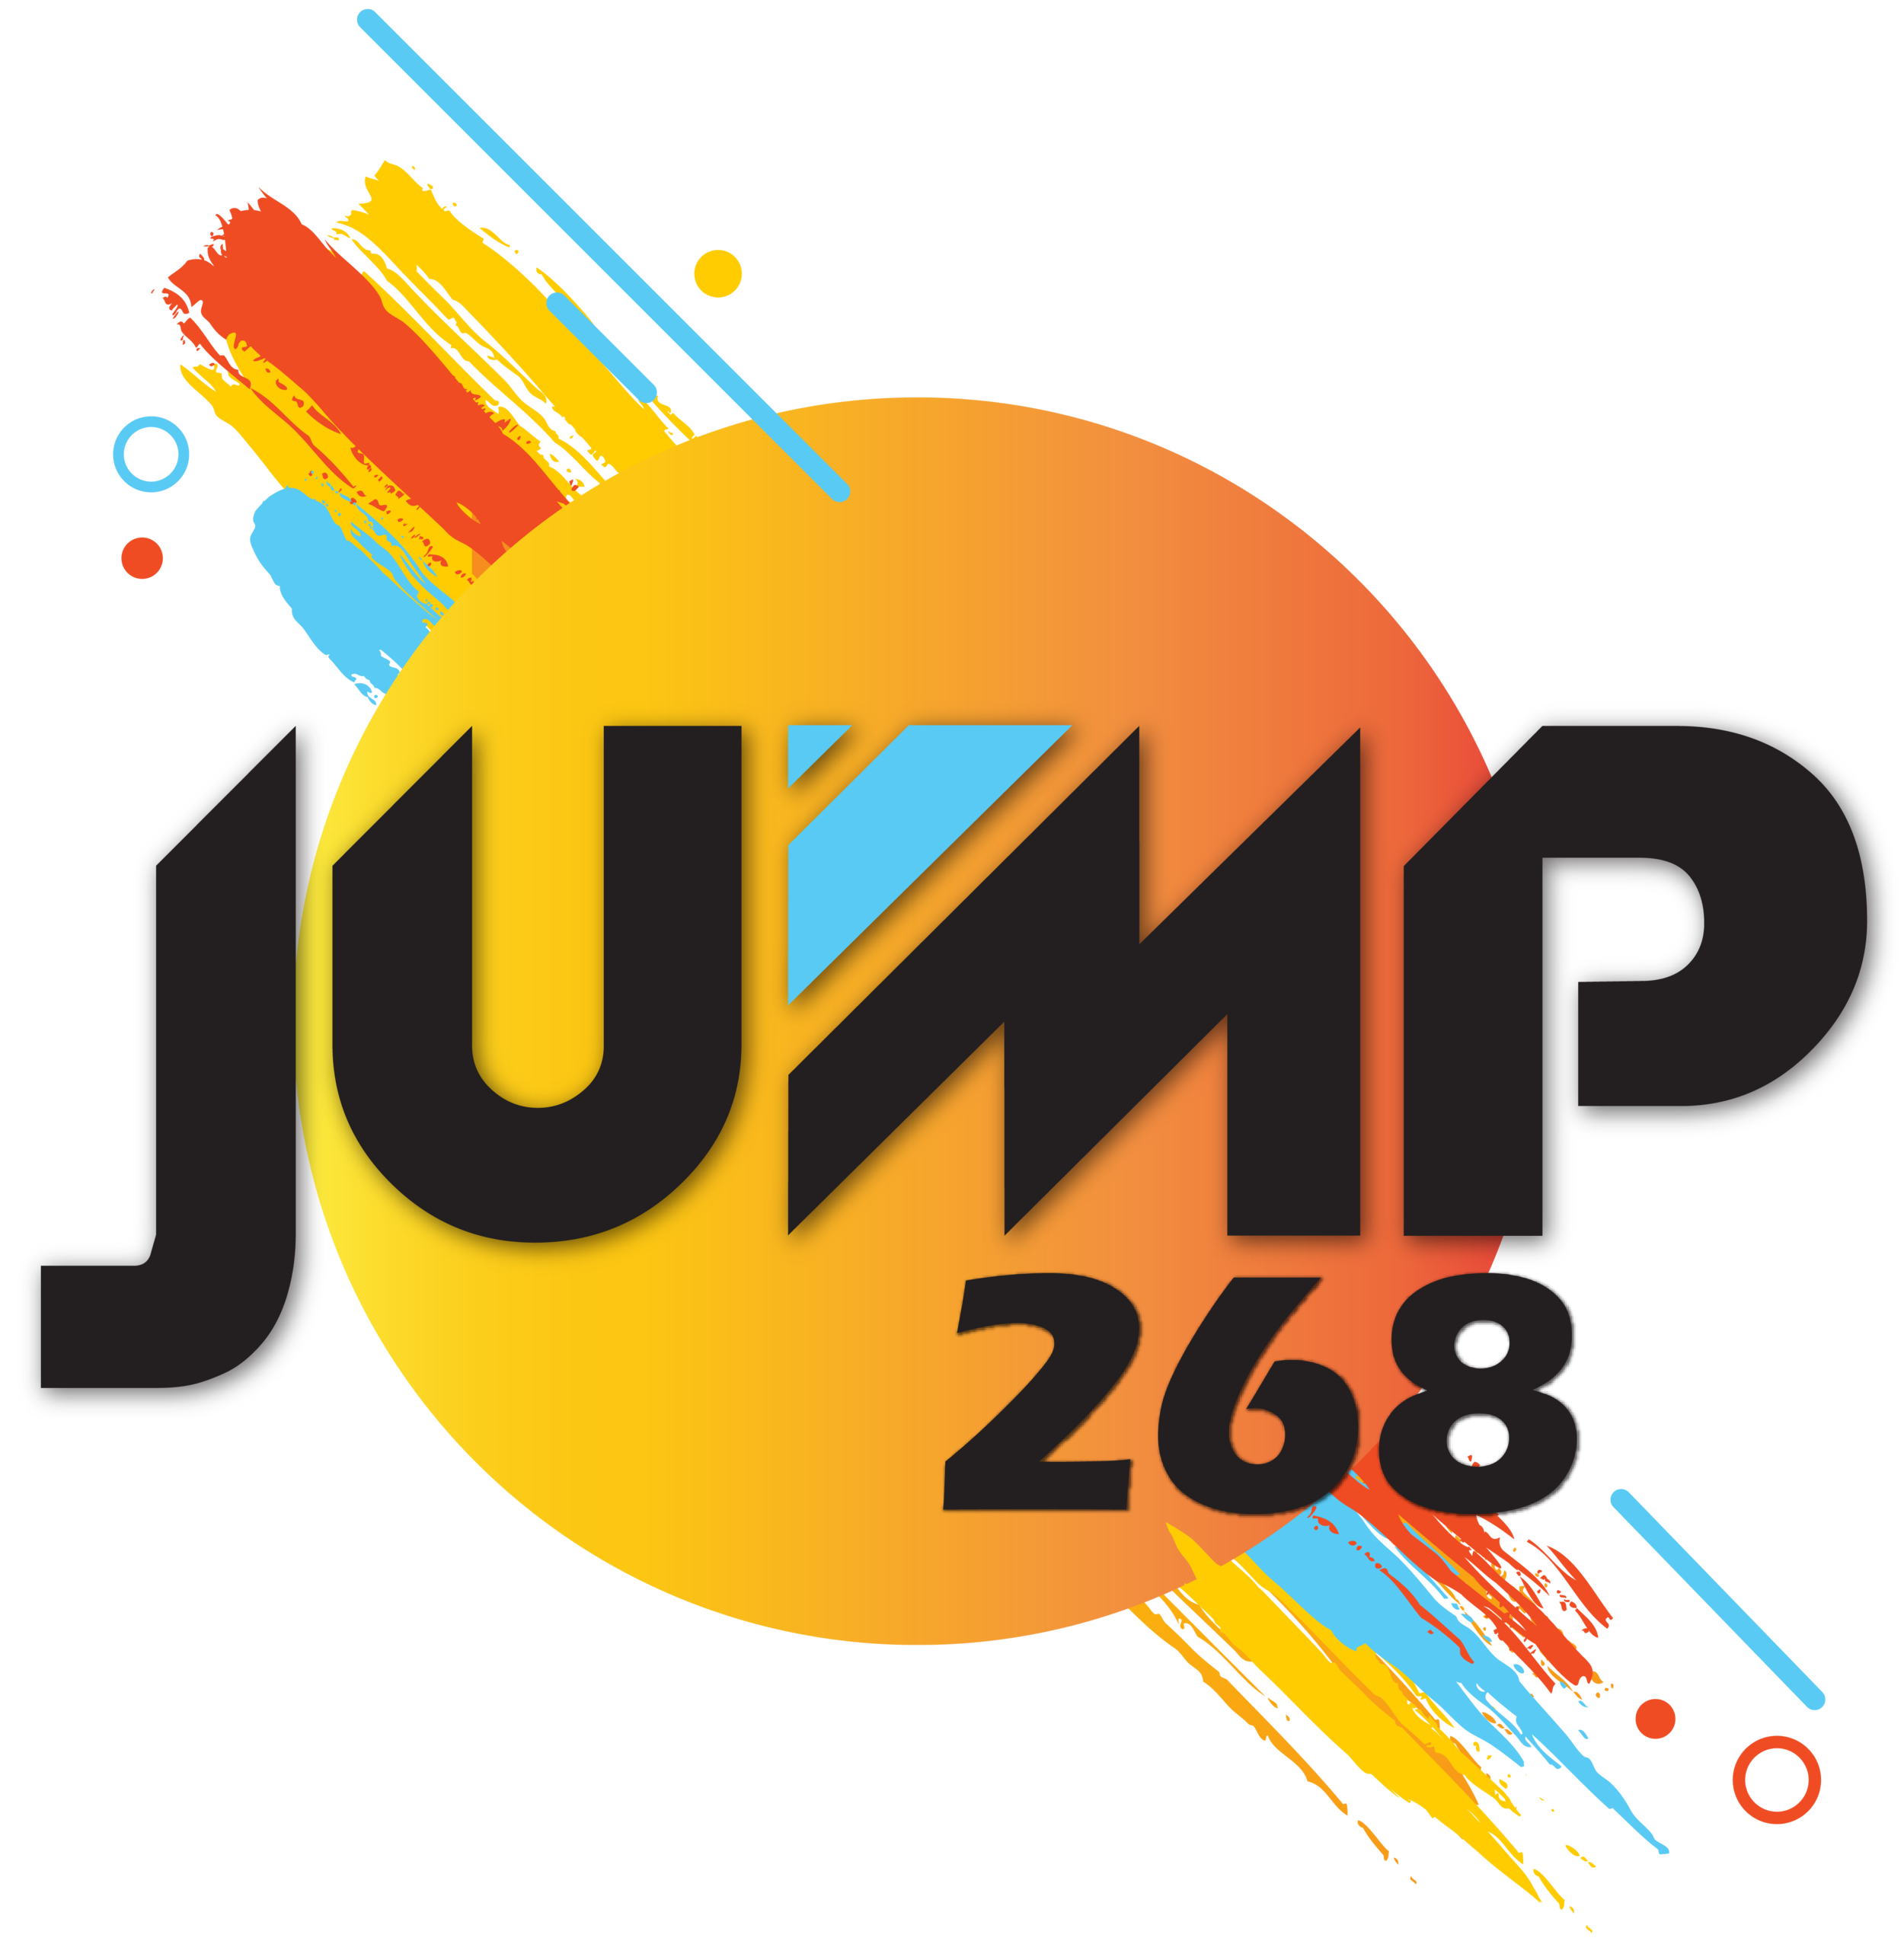 Jump_268_FullLogo_Colour.png